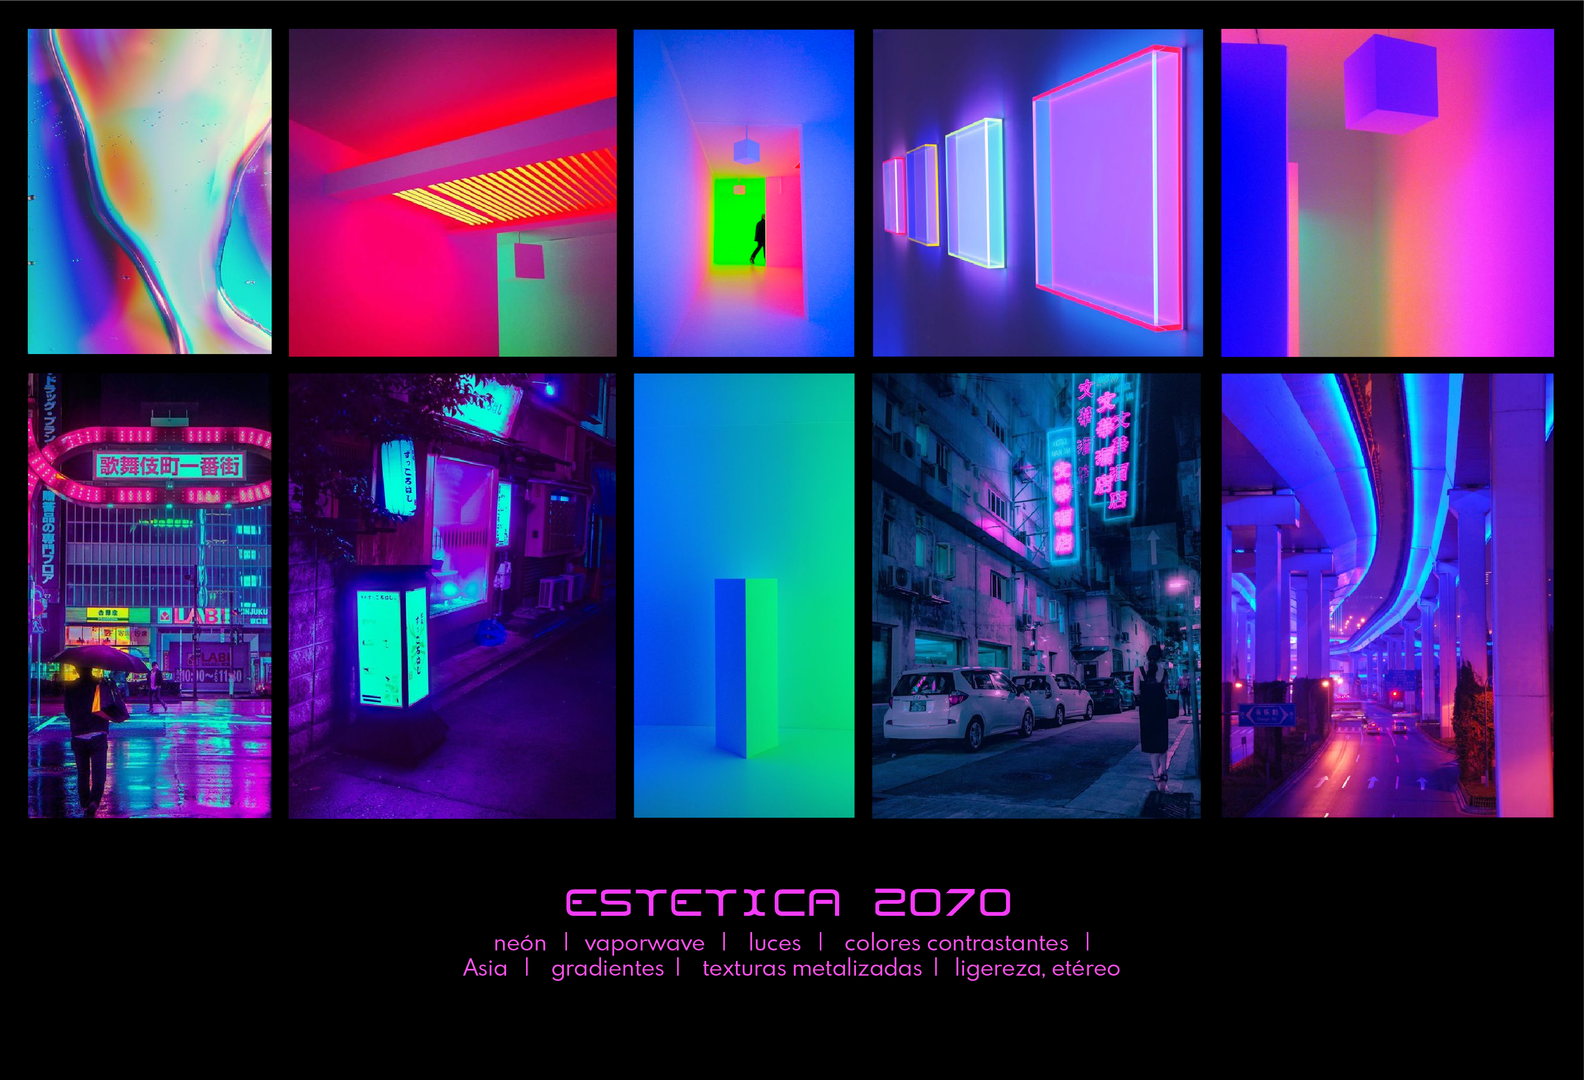 Estética 2070